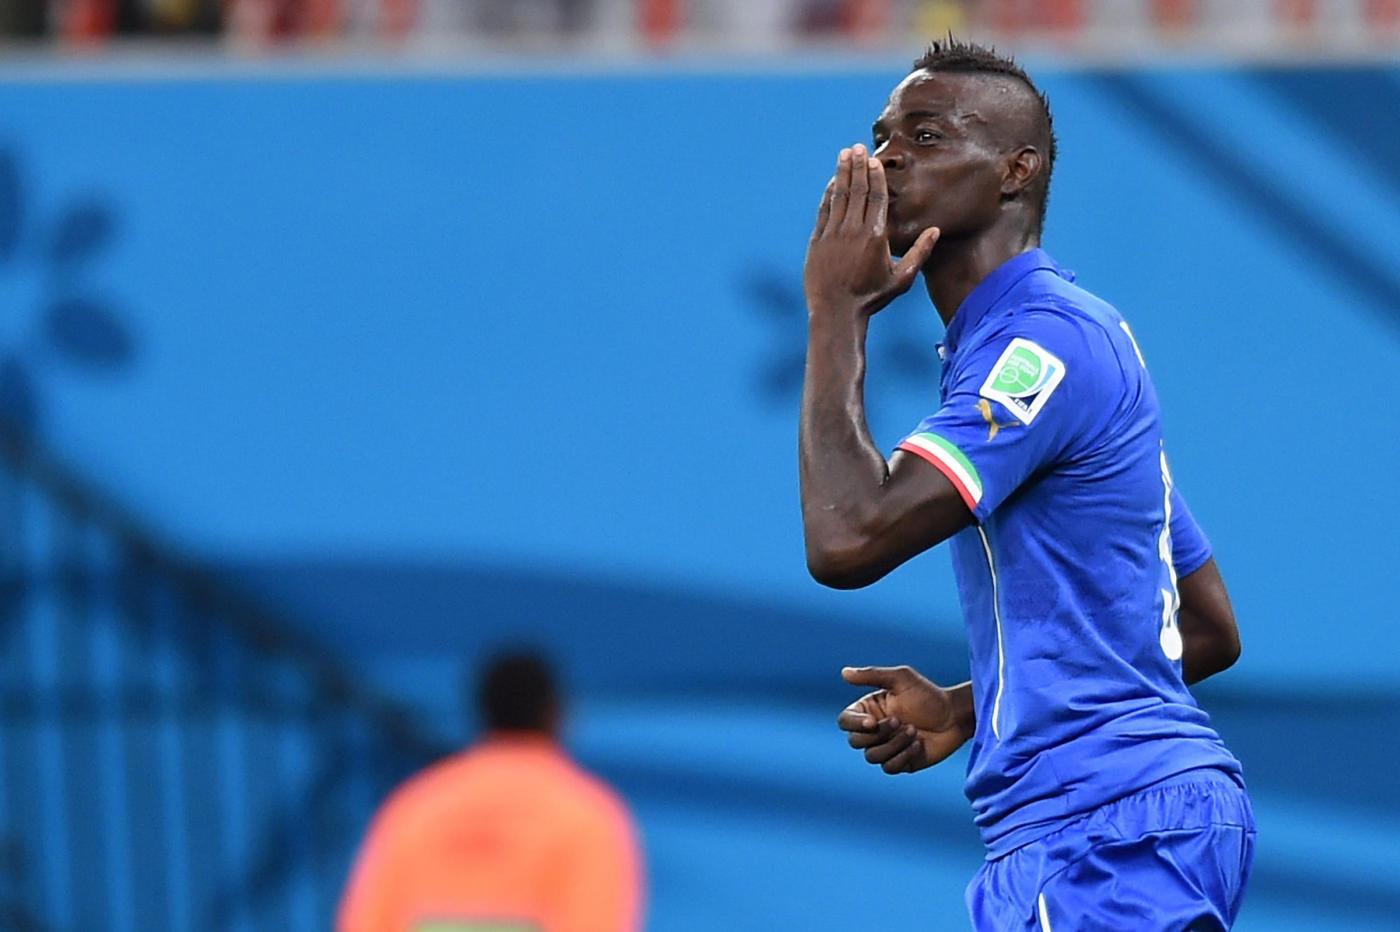 Mondiali 2014, Italia vs Inghilterra 2-1: Marchisio e Balotelli lanciano gli azzurri